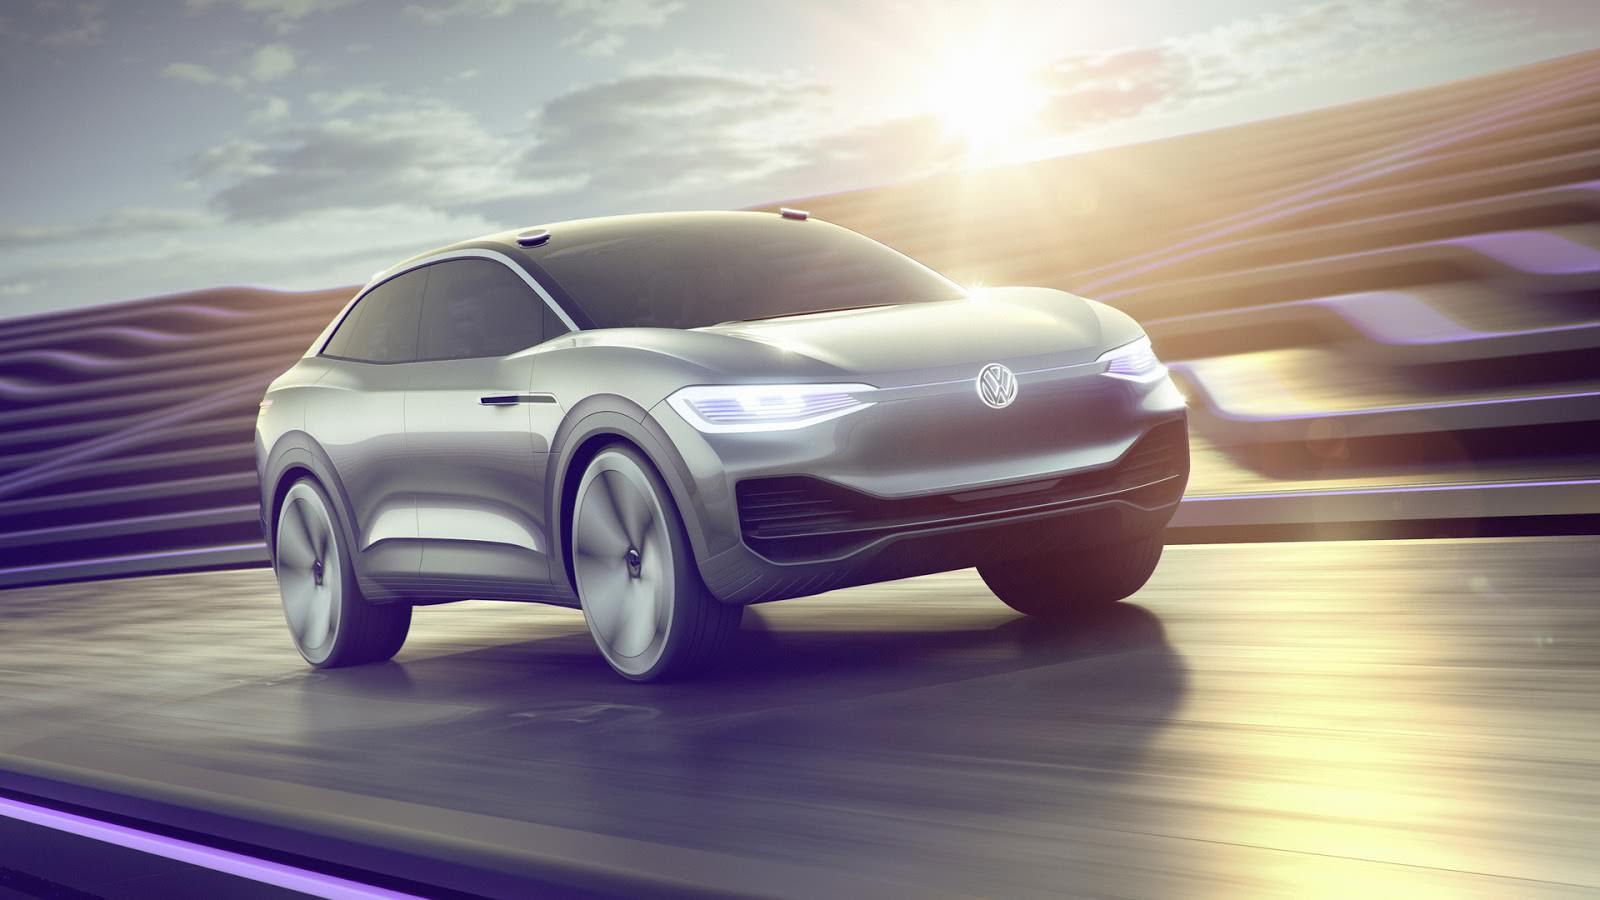 Электрический прототип автопилотом Volkswagen I.D. Crozz